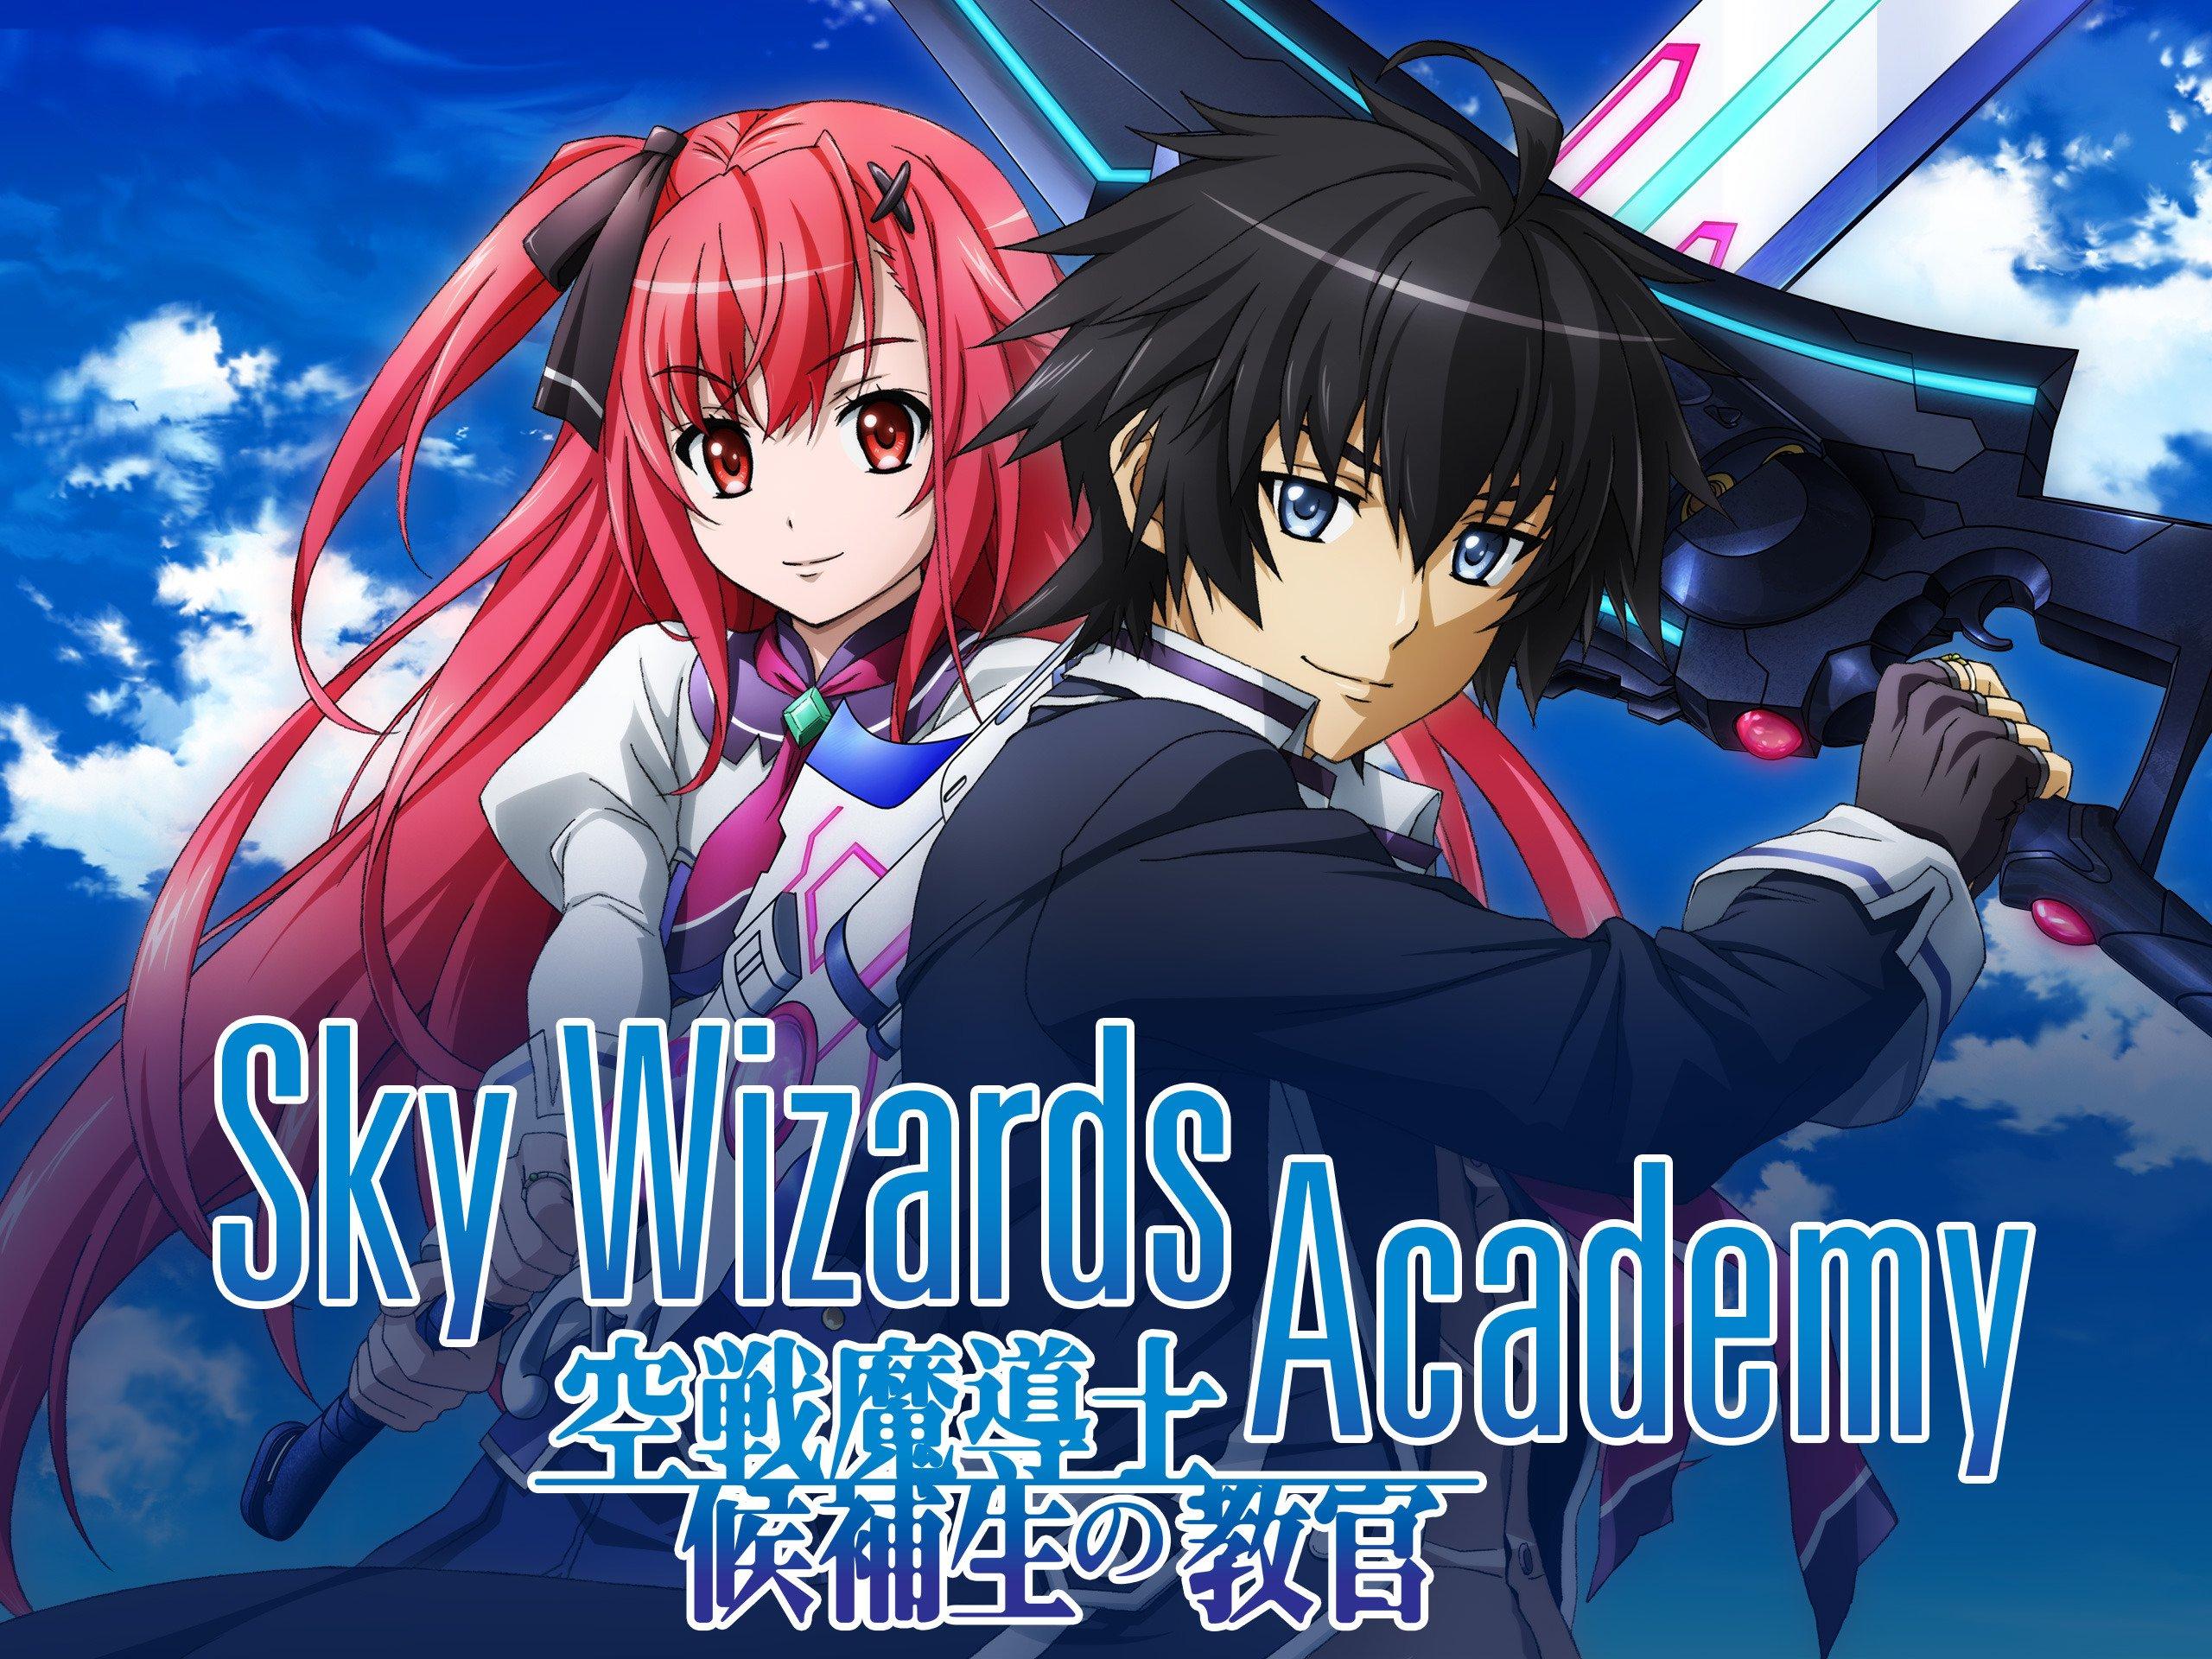 View Sky Wizards Academy Kanata Power JPG